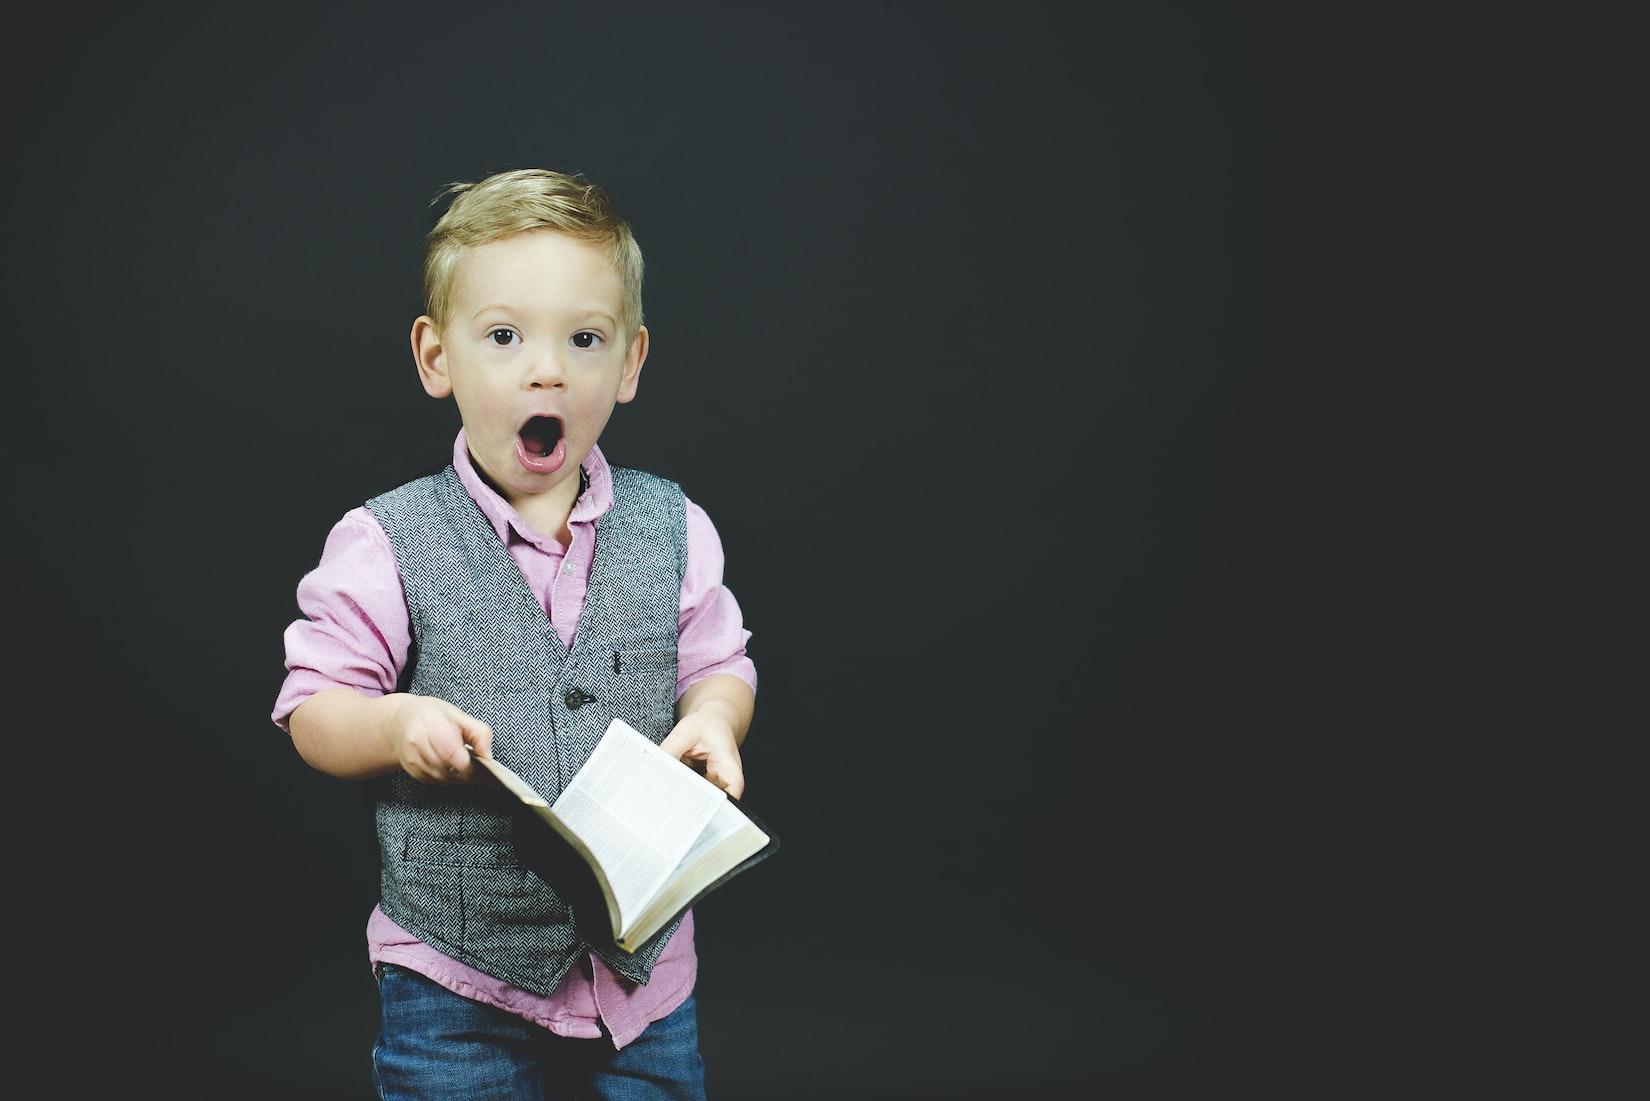 little school kid holding a book